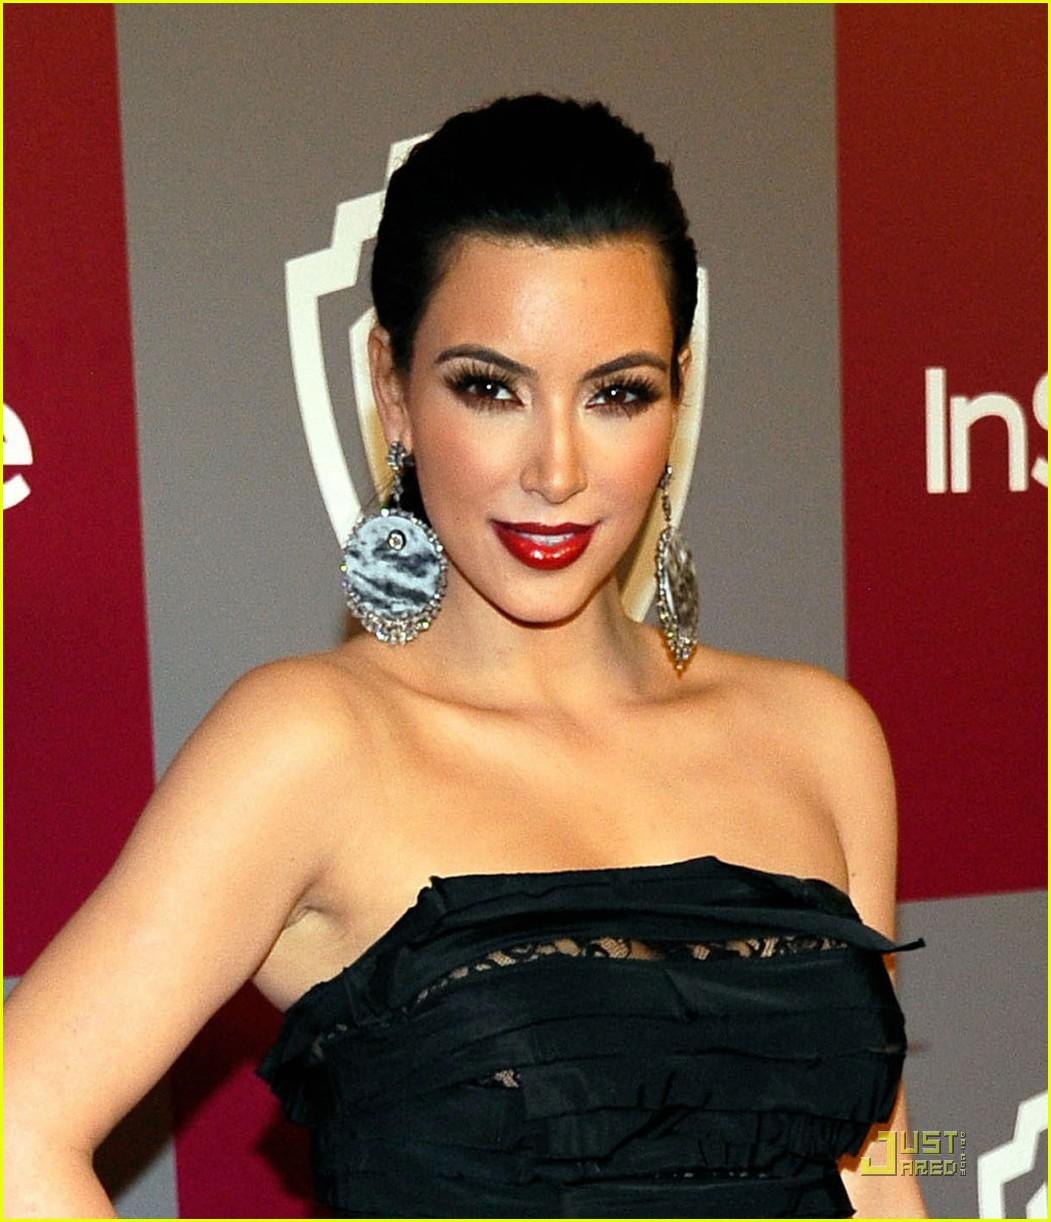 http://4.bp.blogspot.com/_lfaysHpddTs/TTQRCS5xxEI/AAAAAAAAC64/sOBZ0ZHIEqw/s1600/kim-kardashian-instyle-party-01.jpg